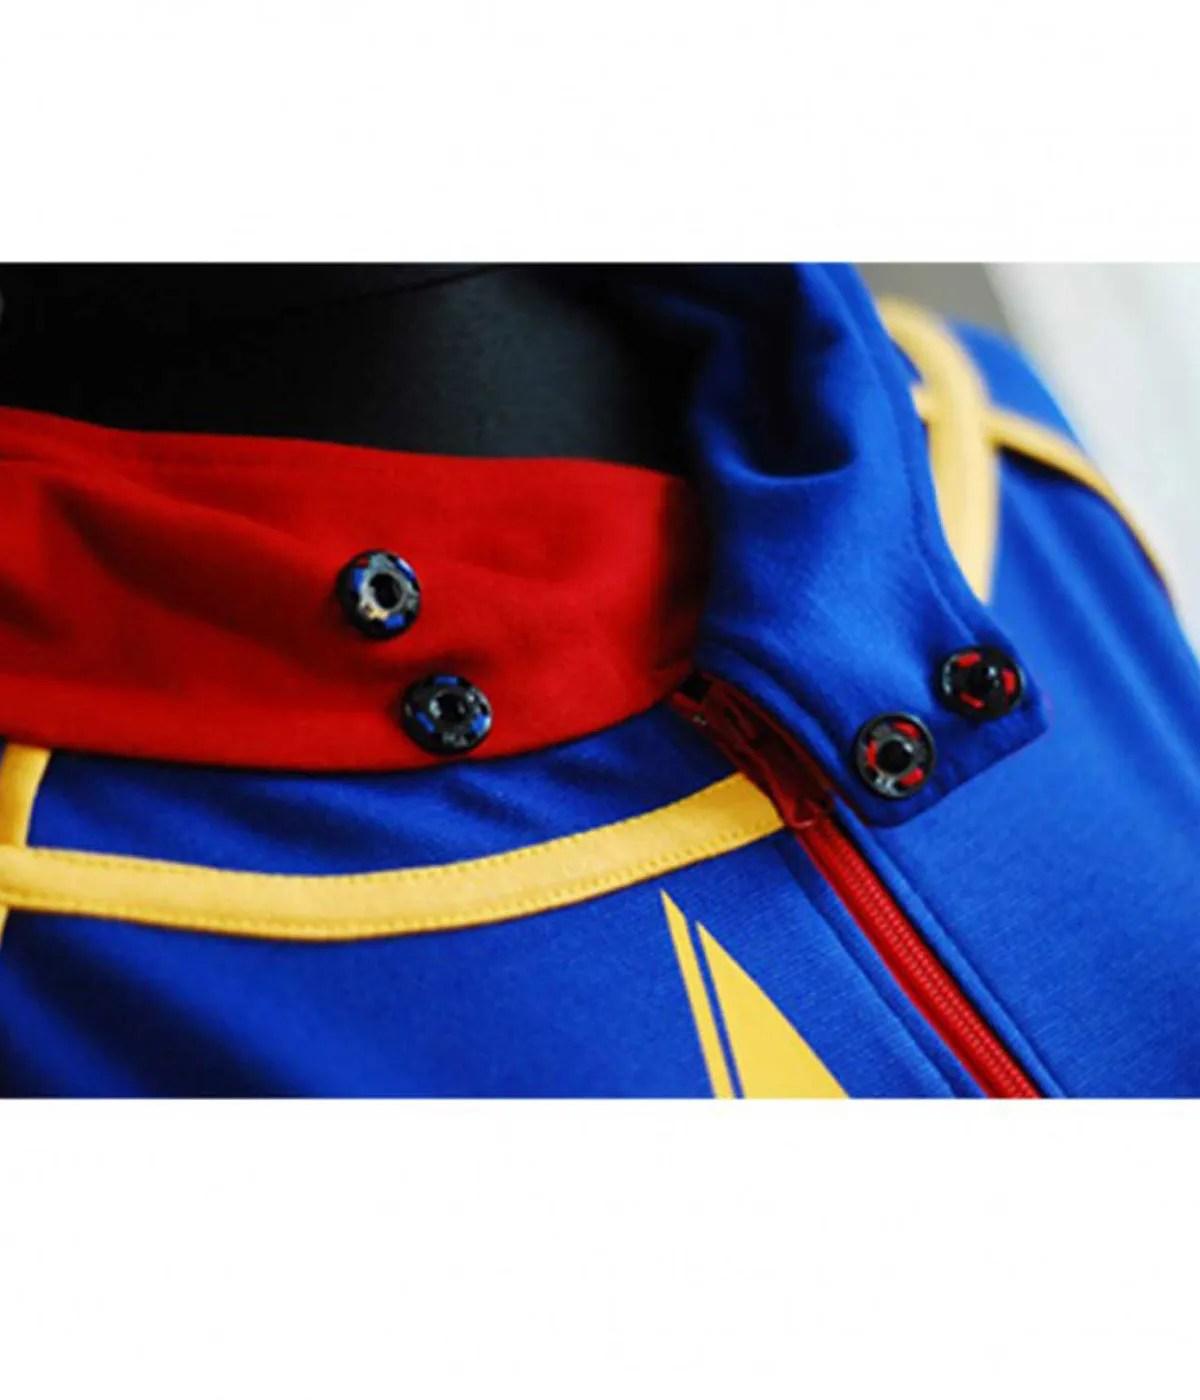 ms-marvel-kamala-khan-blue-hoodie